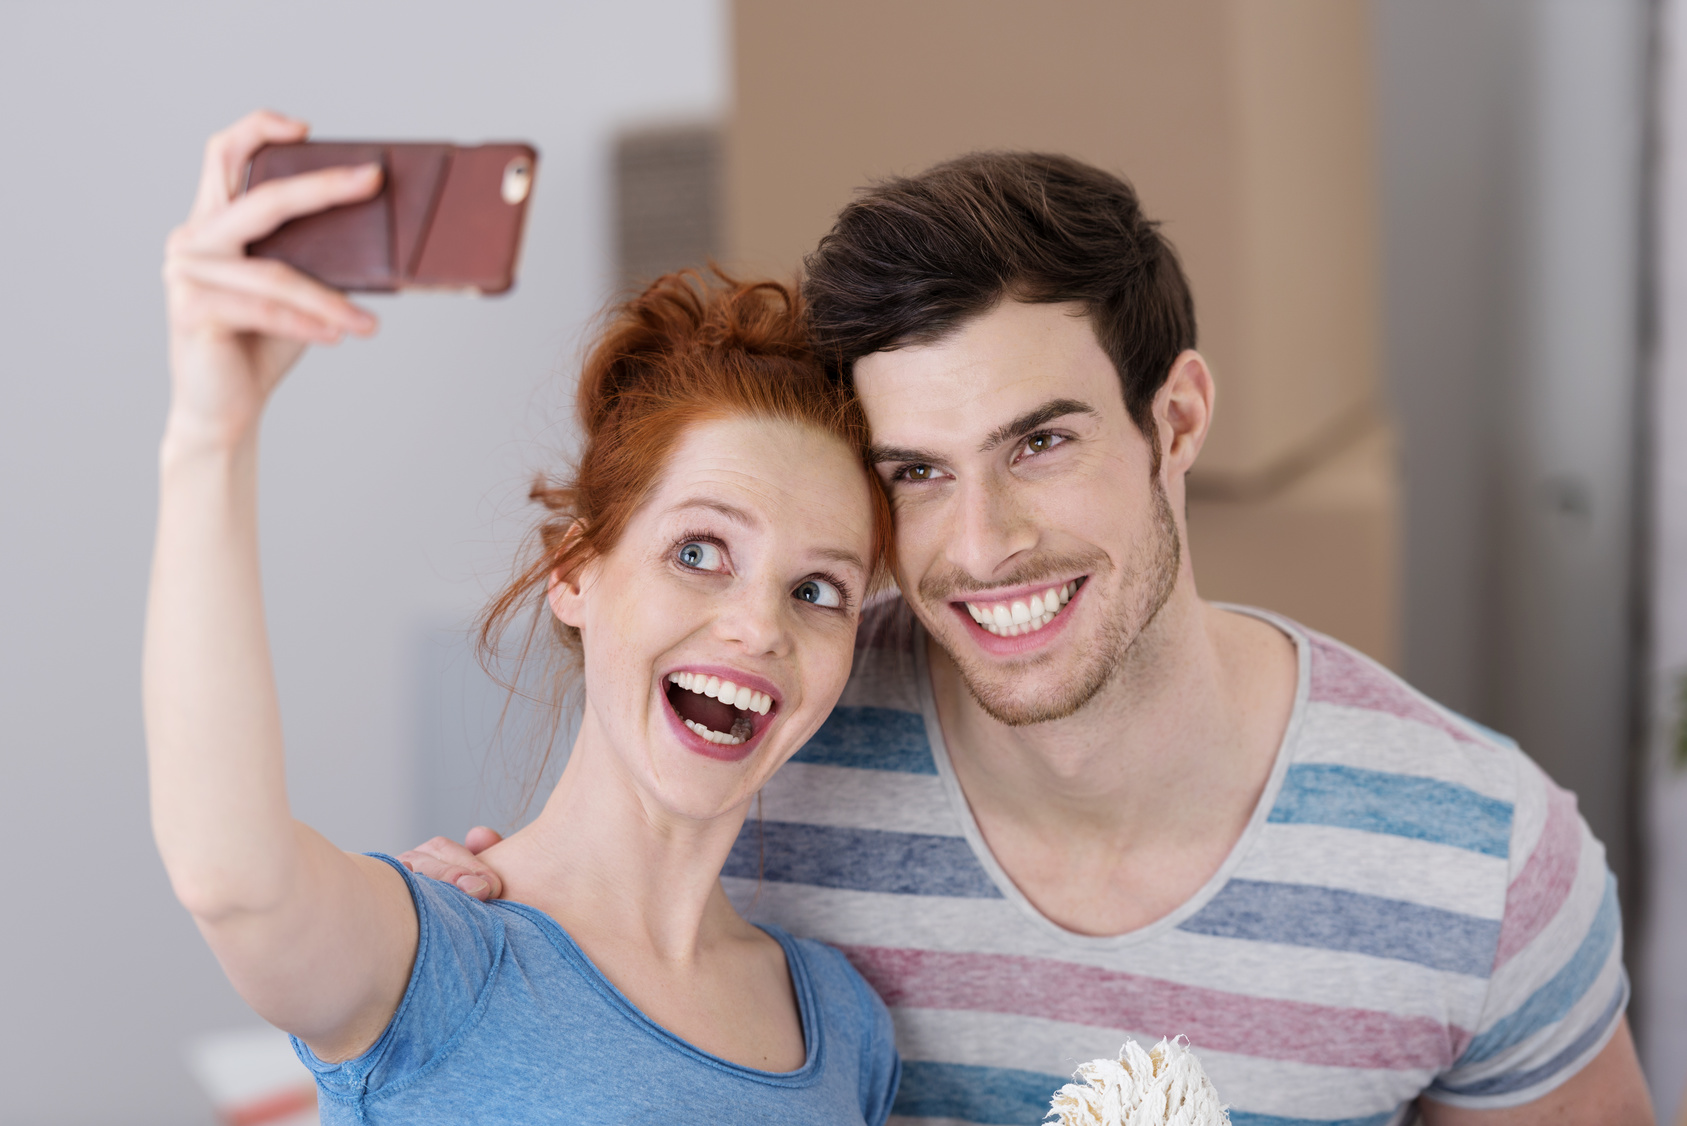 Young couple smiling in biddulph.jpg